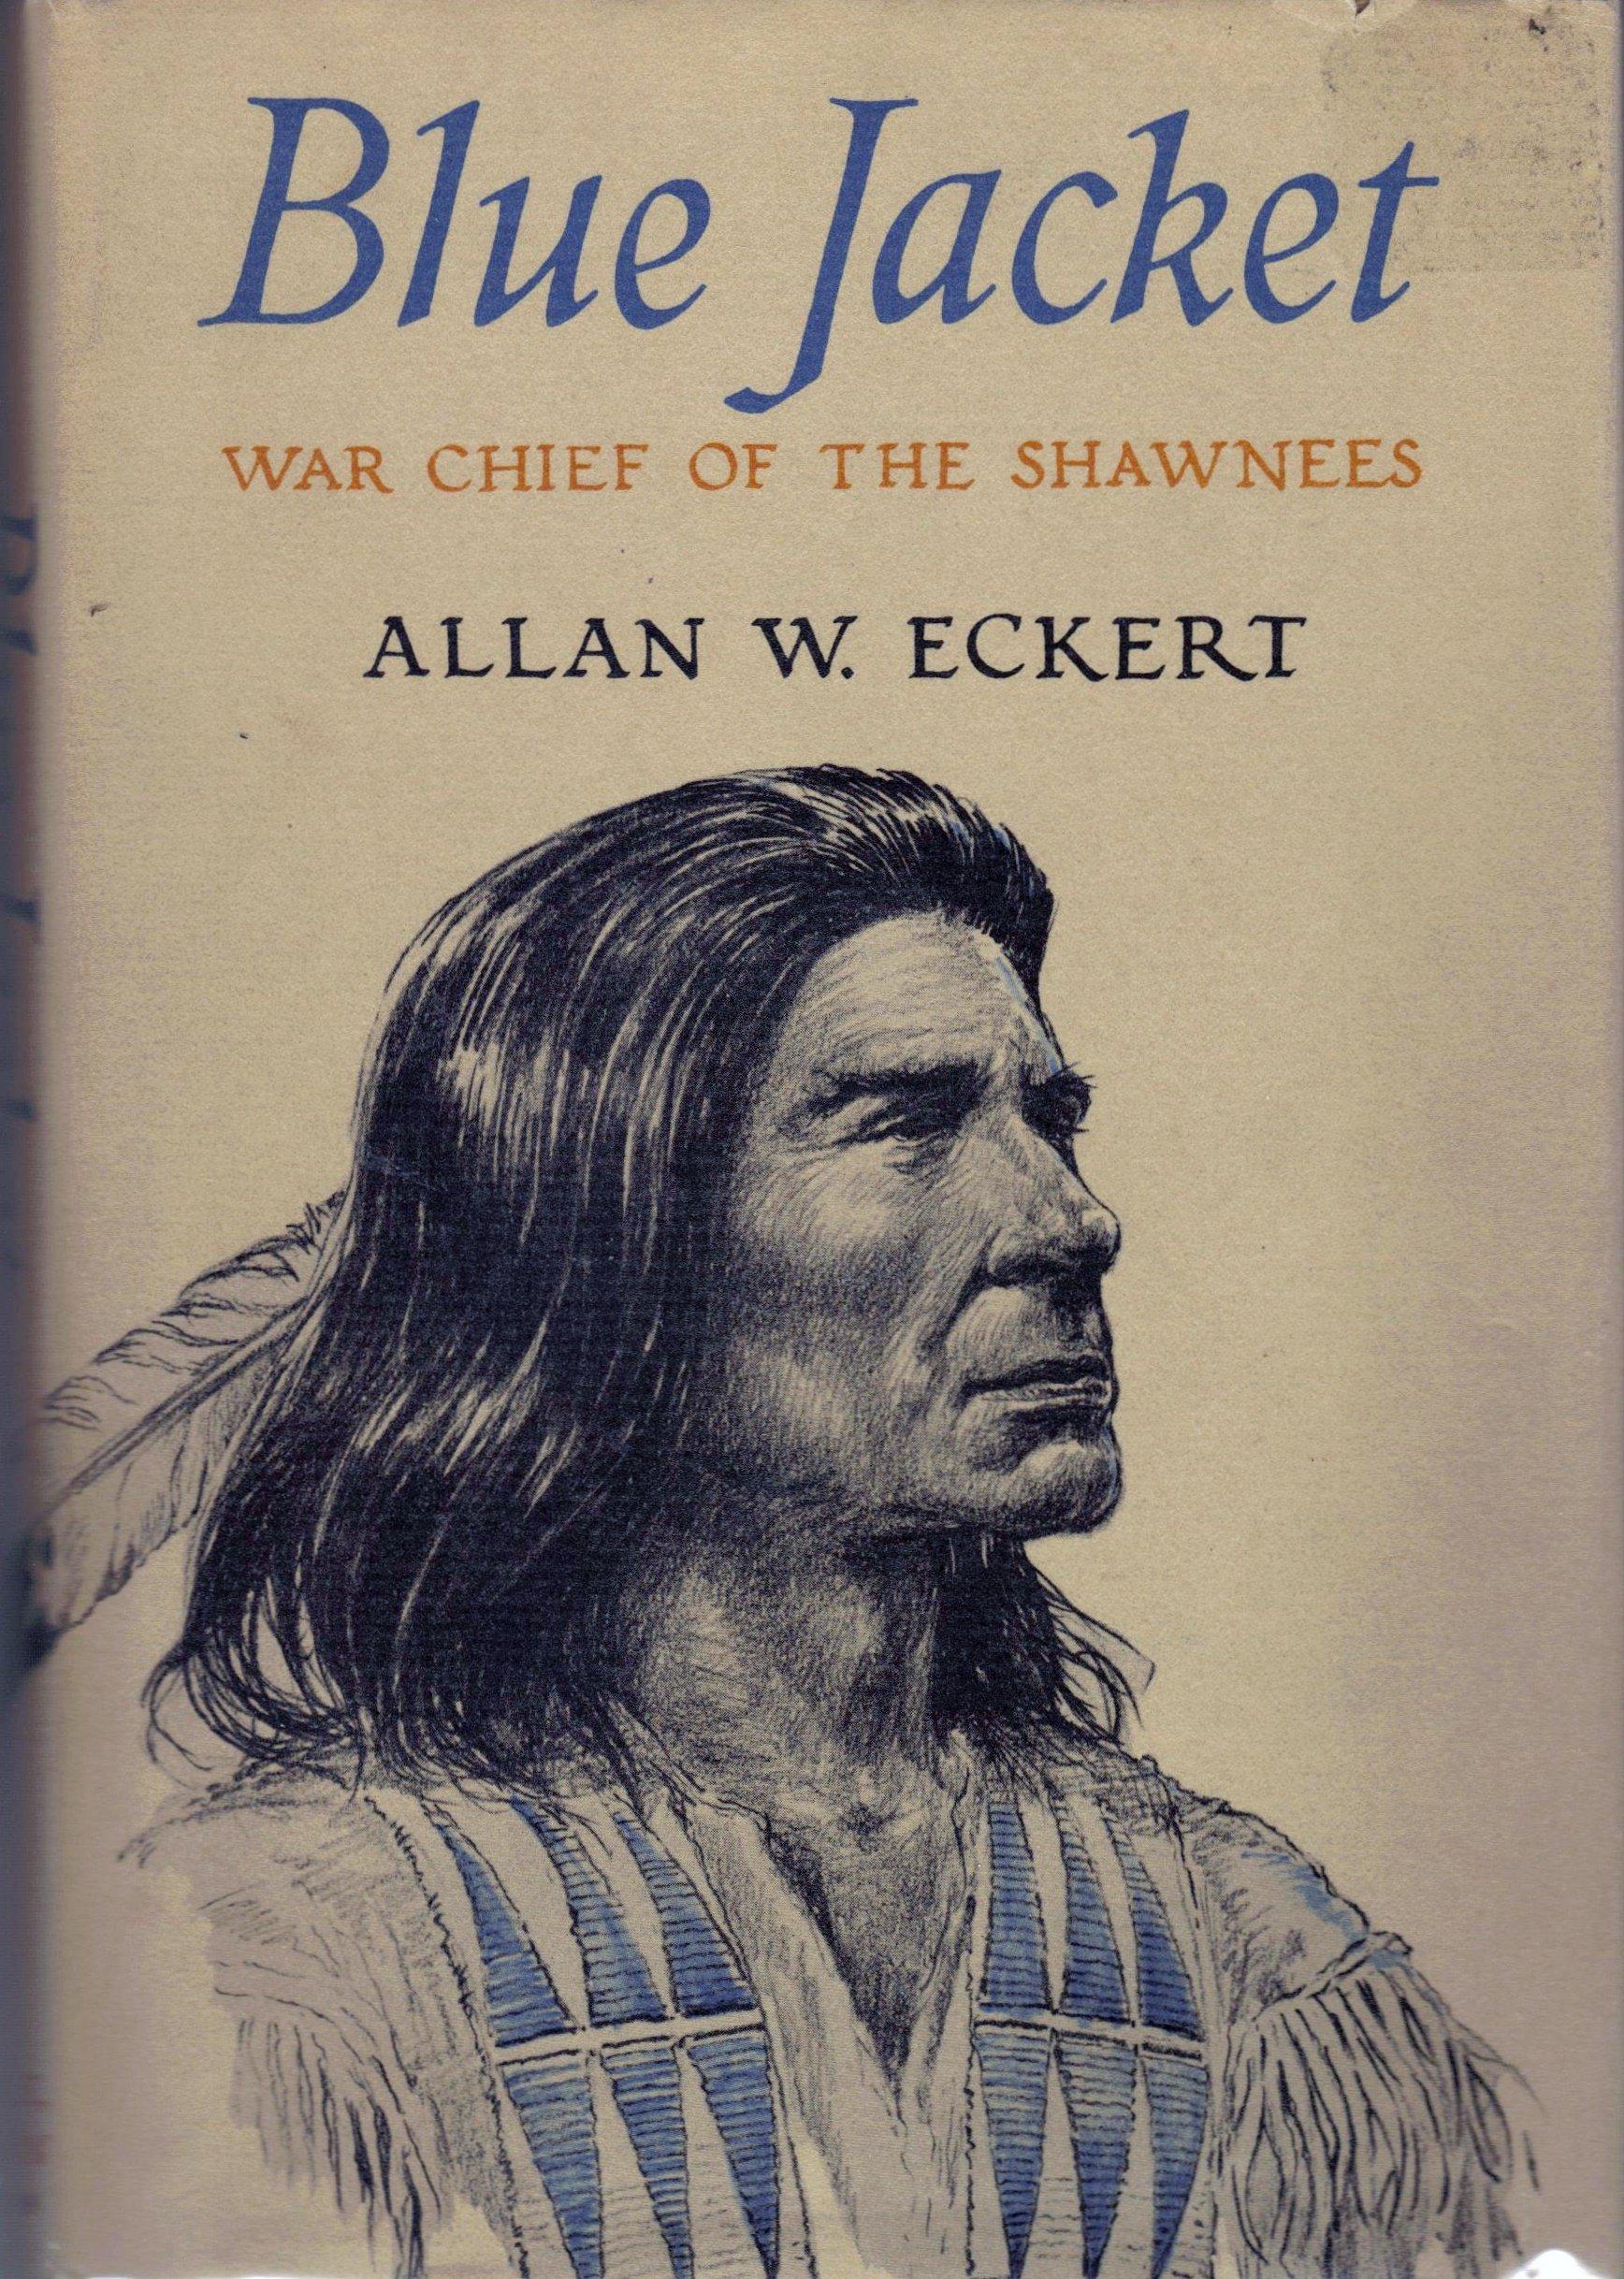 Amazon.com: Blue Jacket: War Chief of the Shawnees (9780316208635 ...